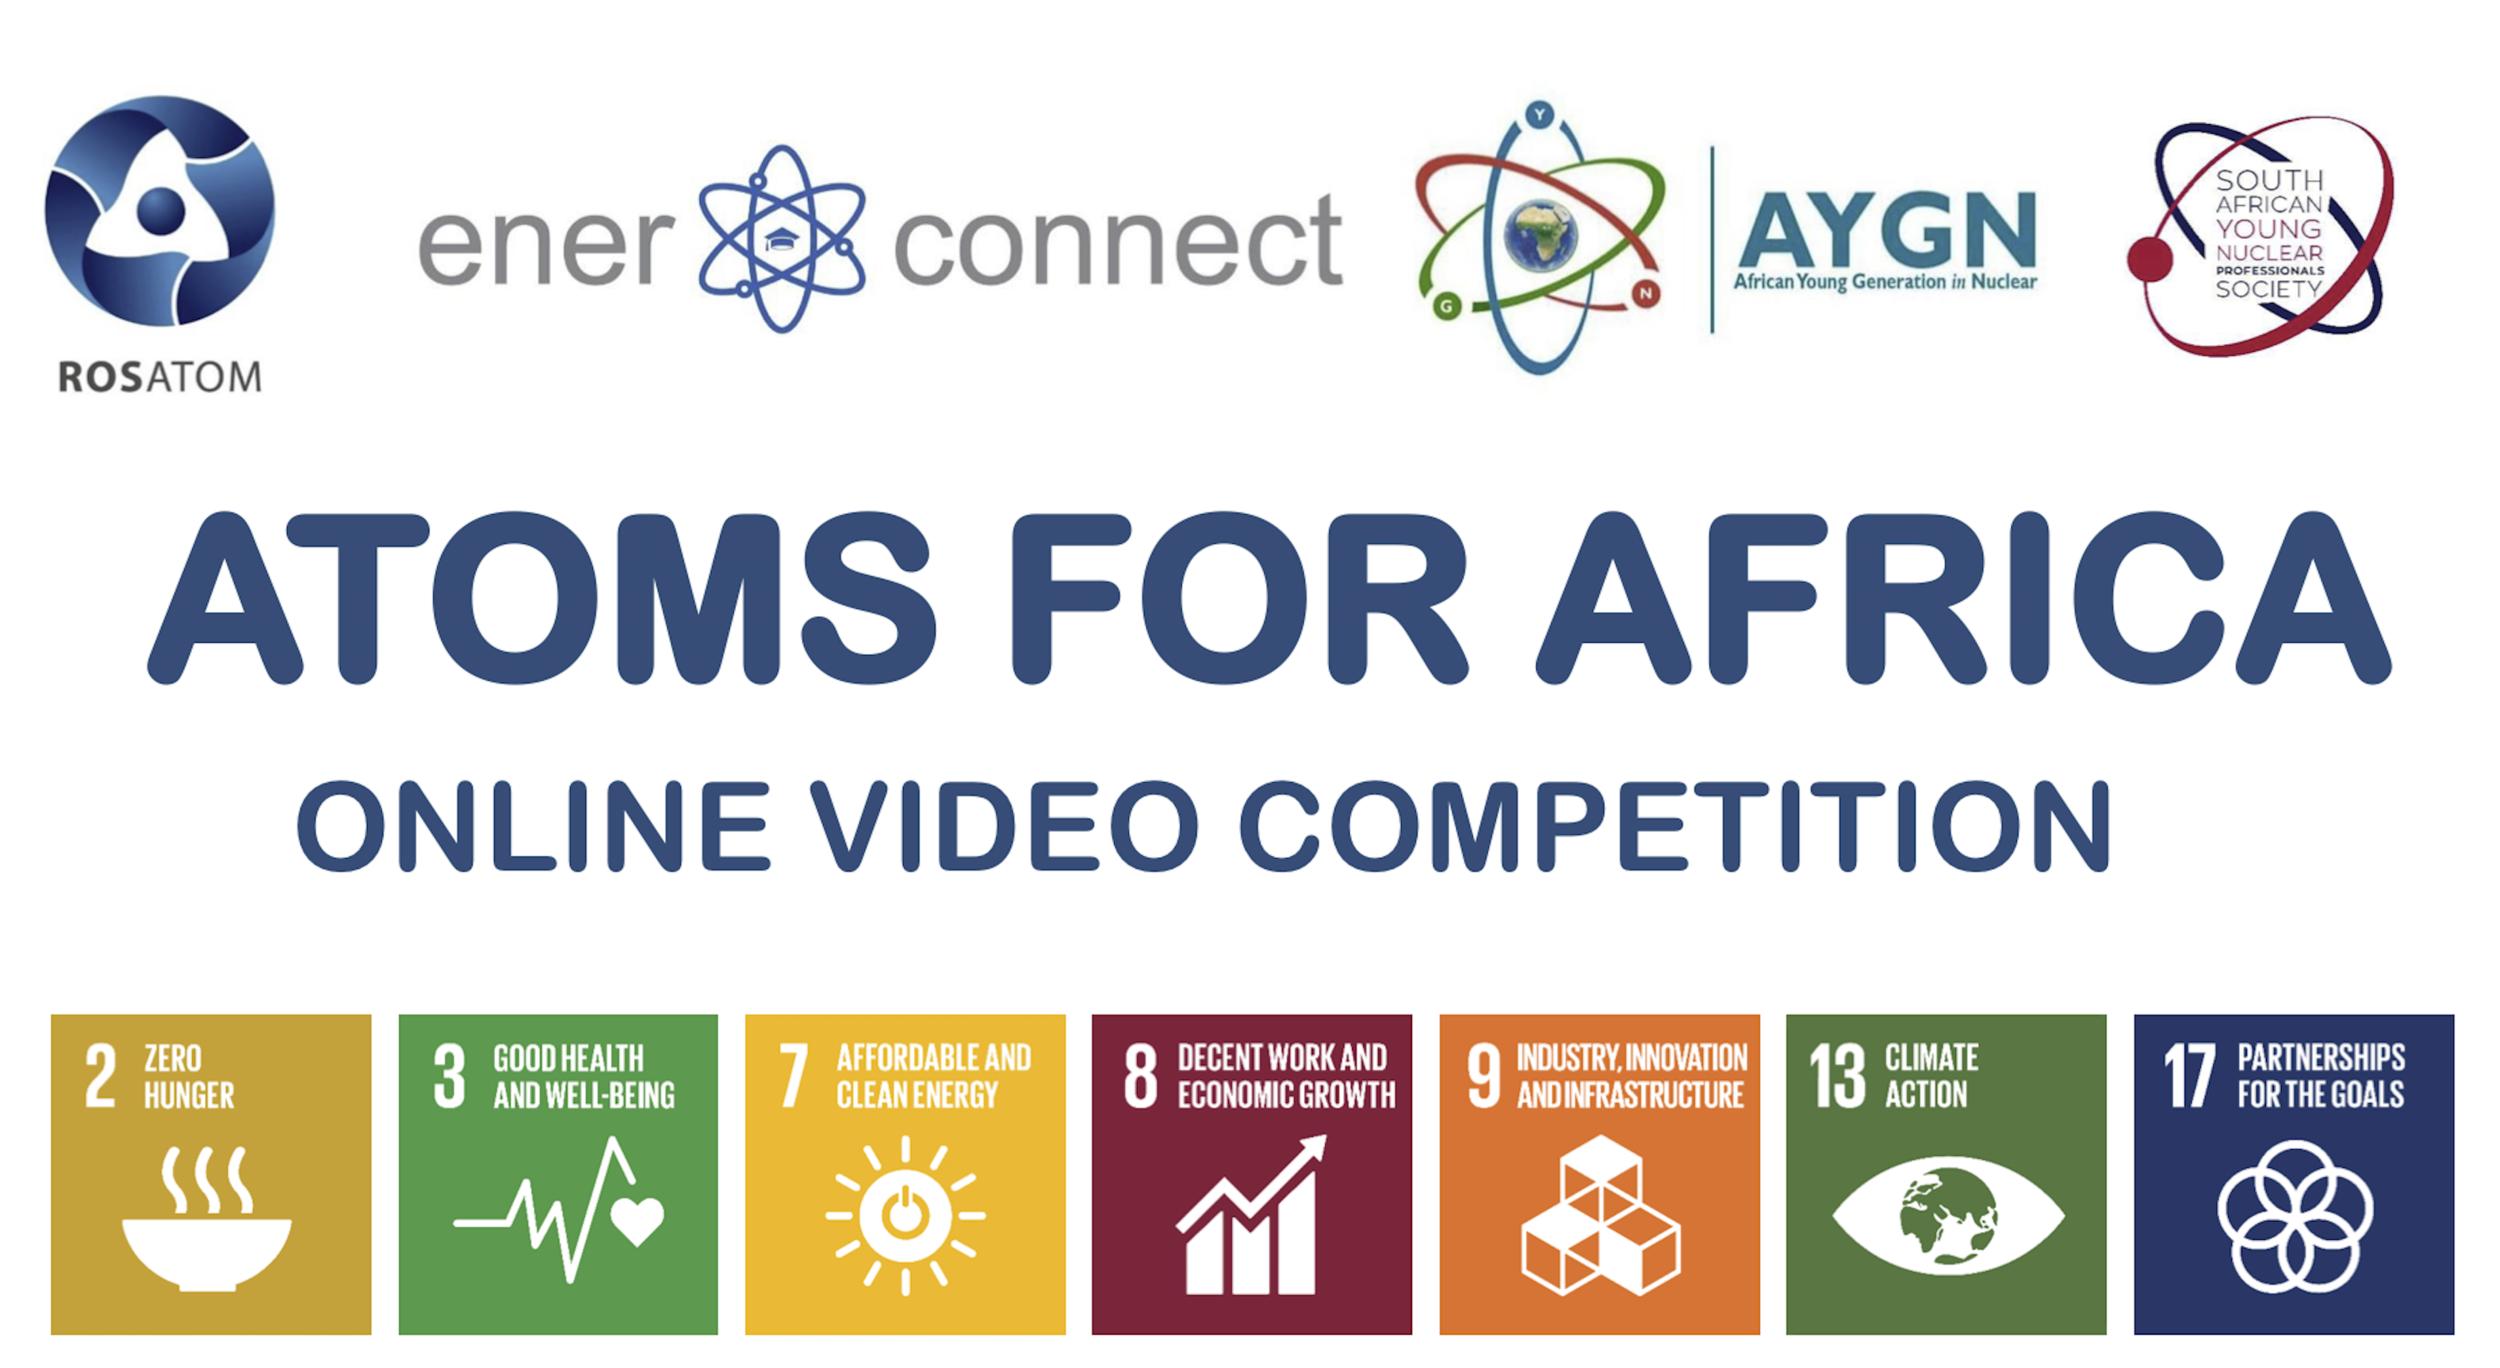 Atoms4AfricaLogo.png